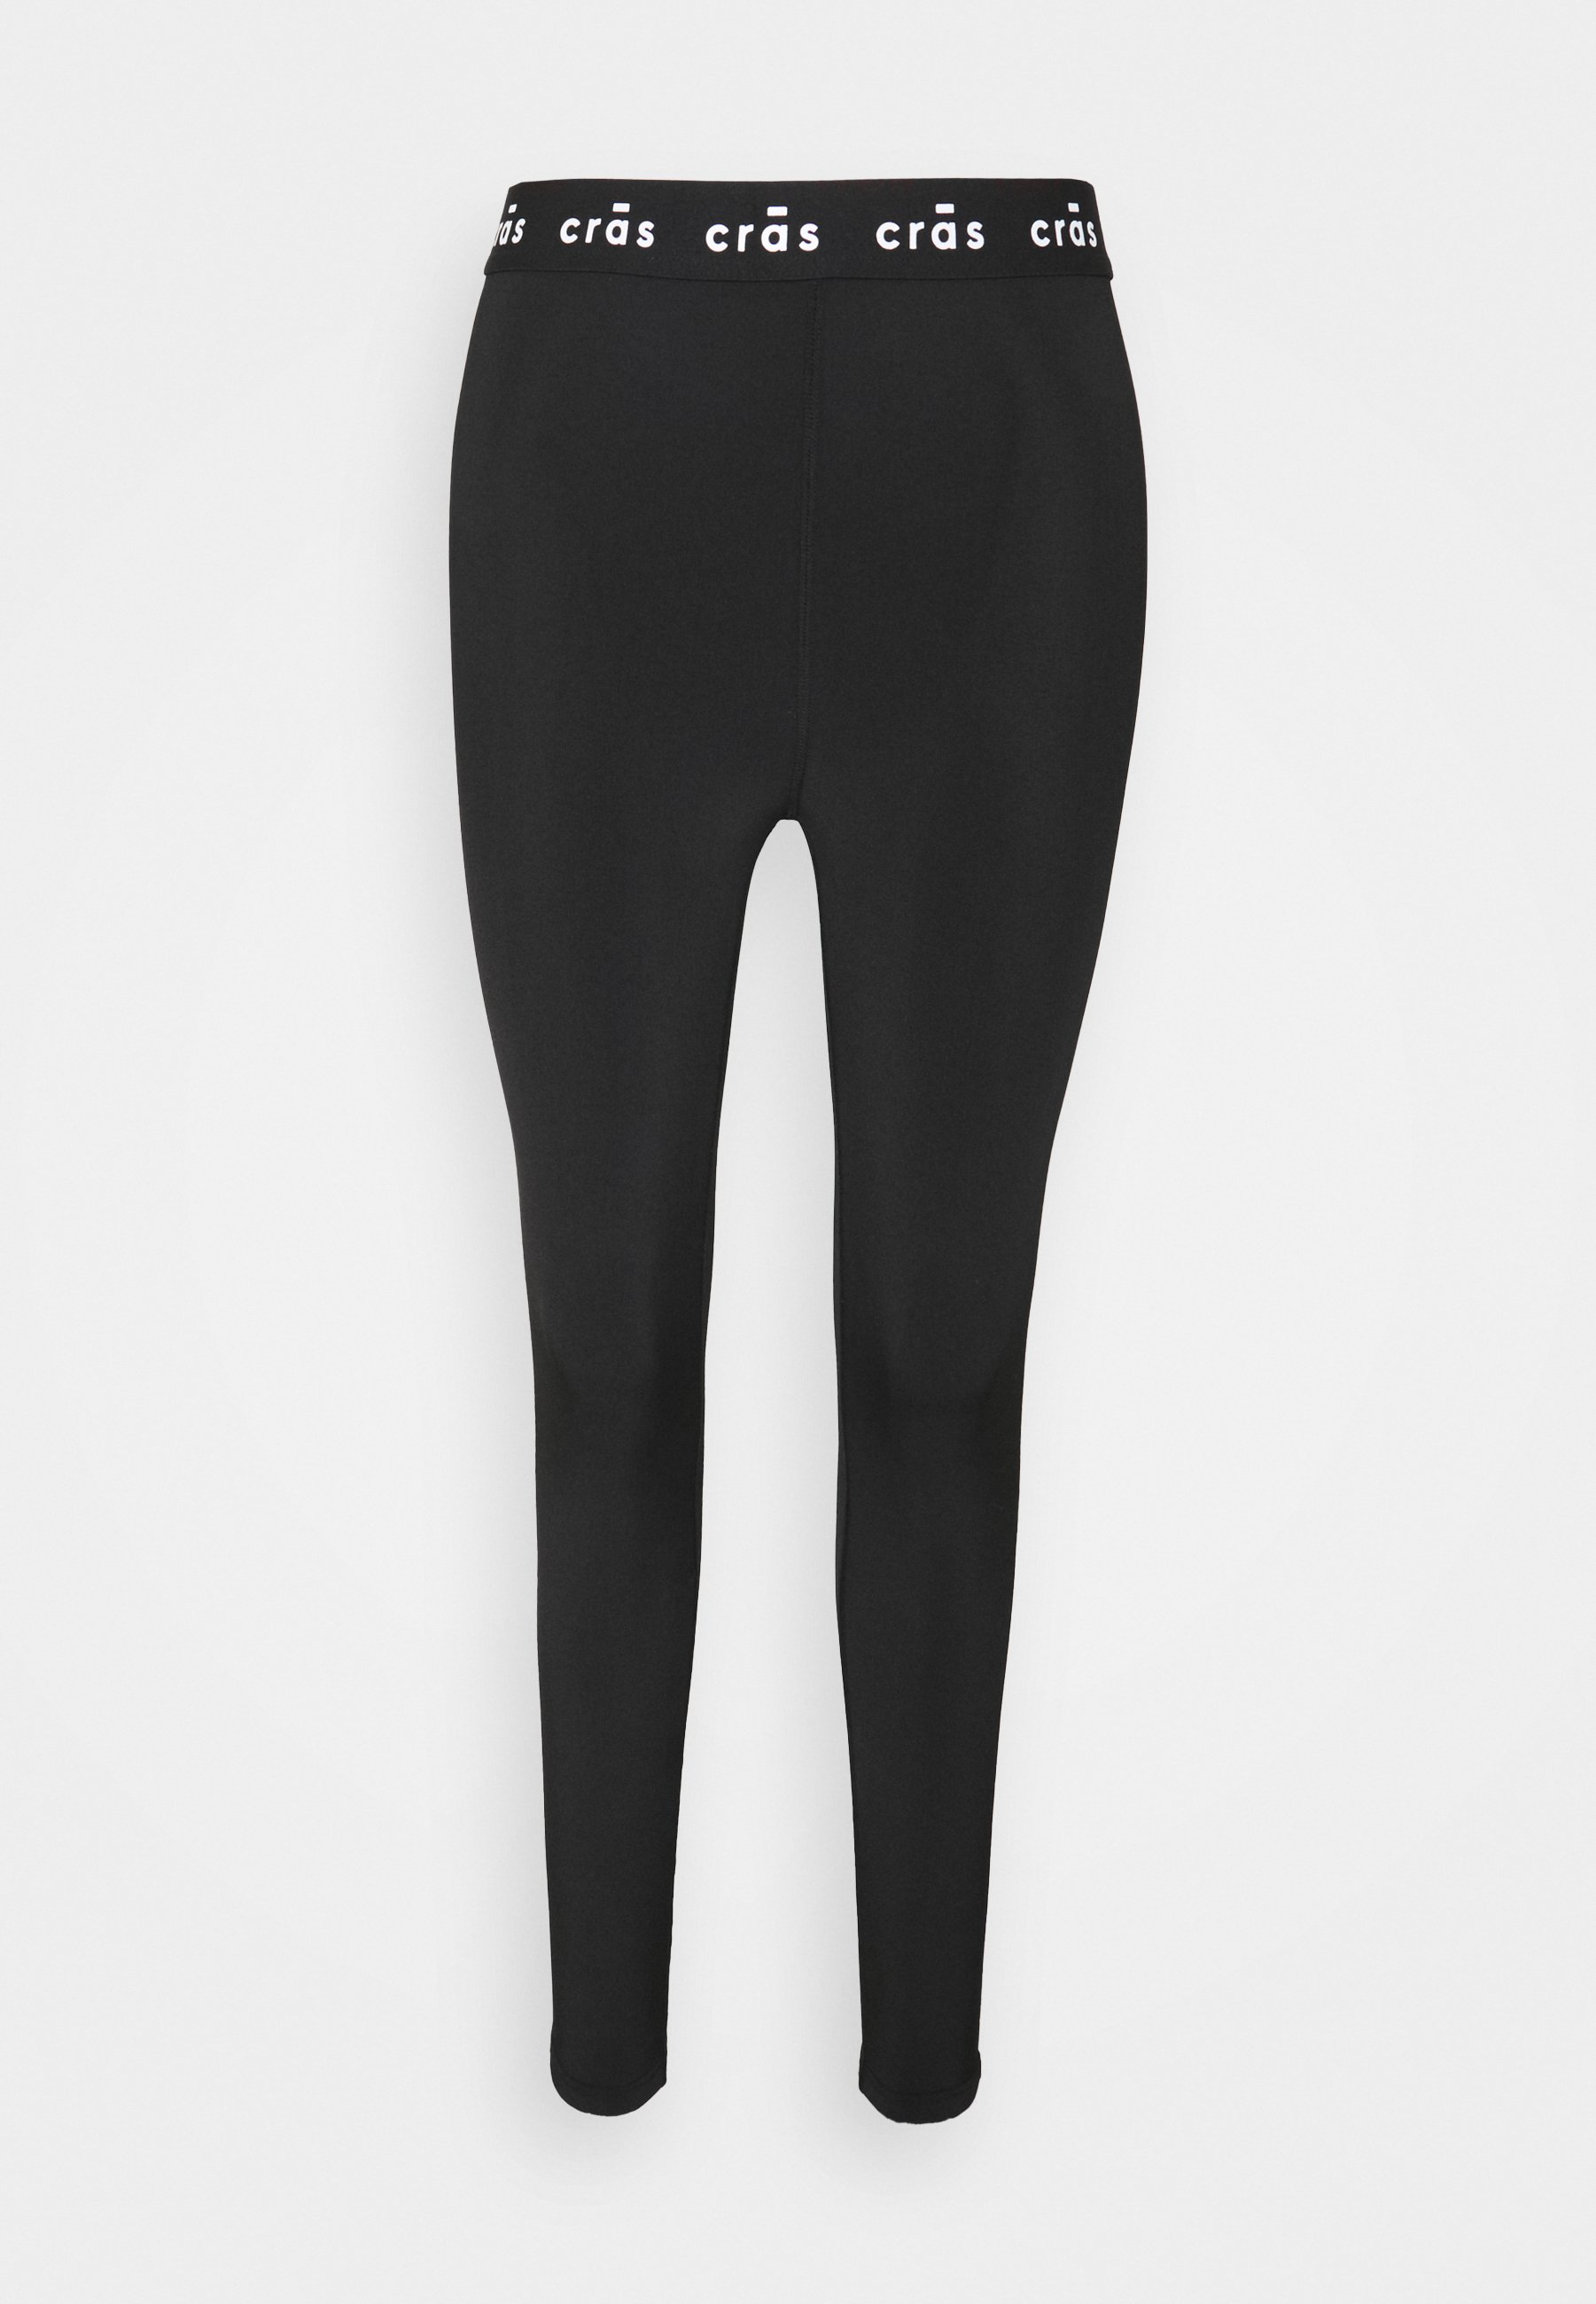 Damen KATECRAS - Leggings - Hosen